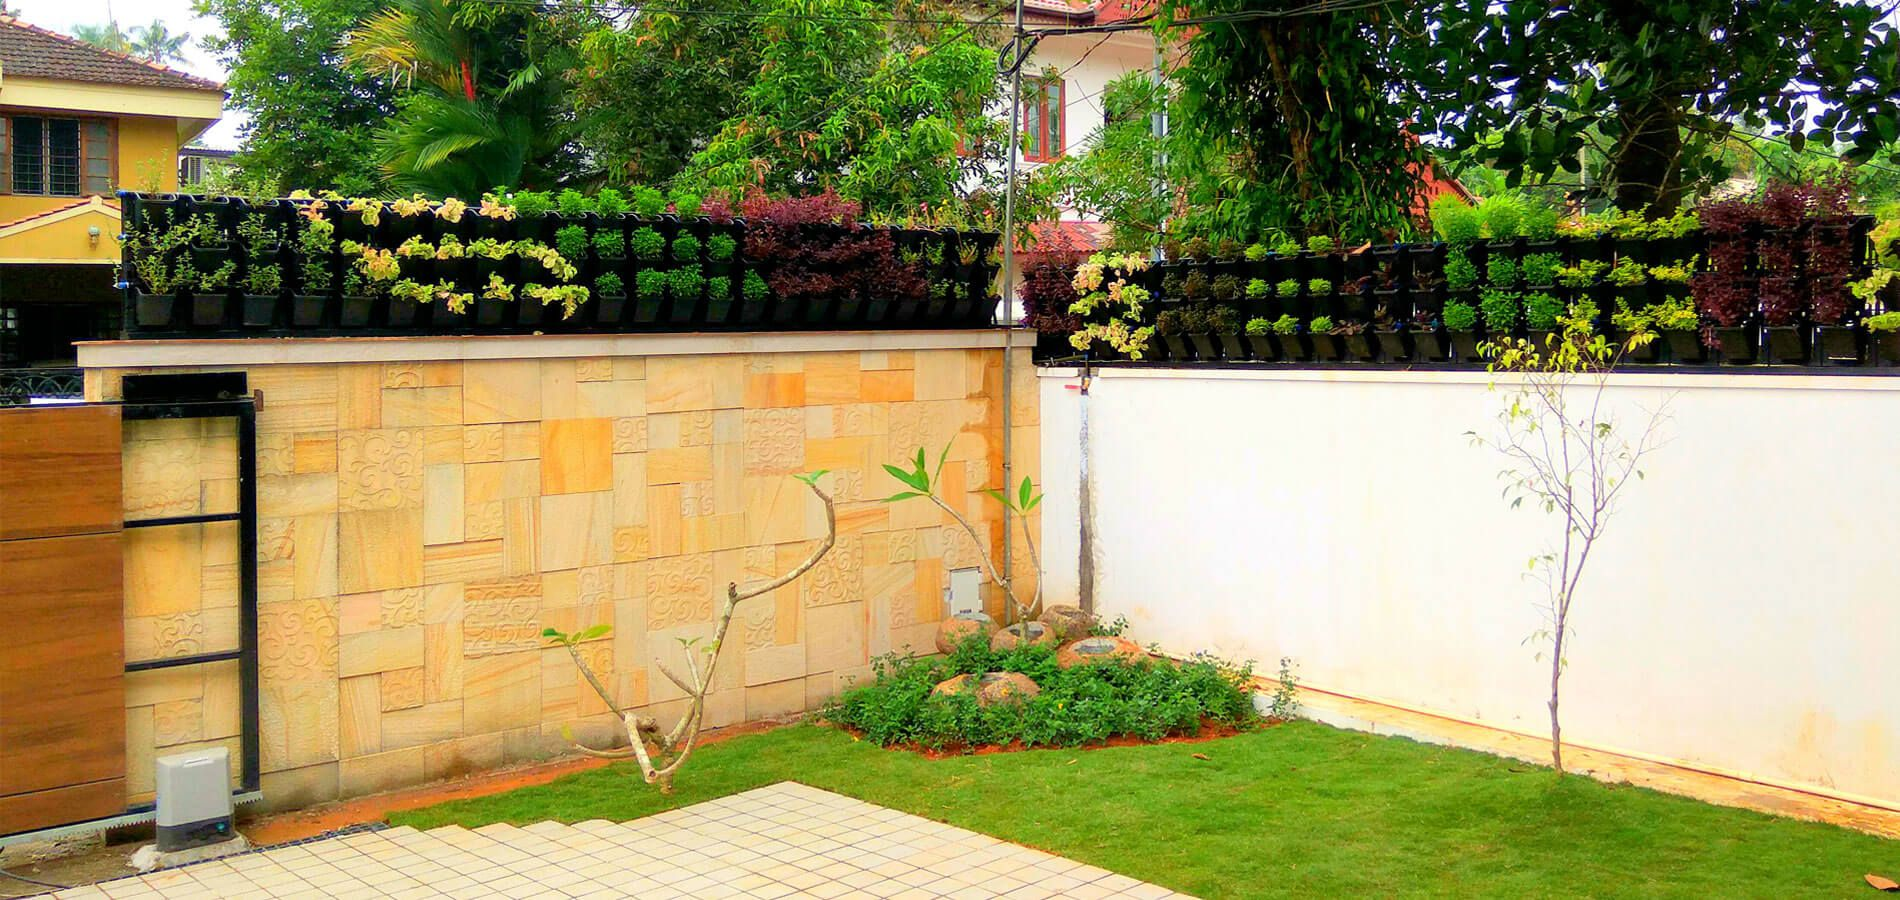 Outdoor Gardens Landscape design, Garden design, Outdoor